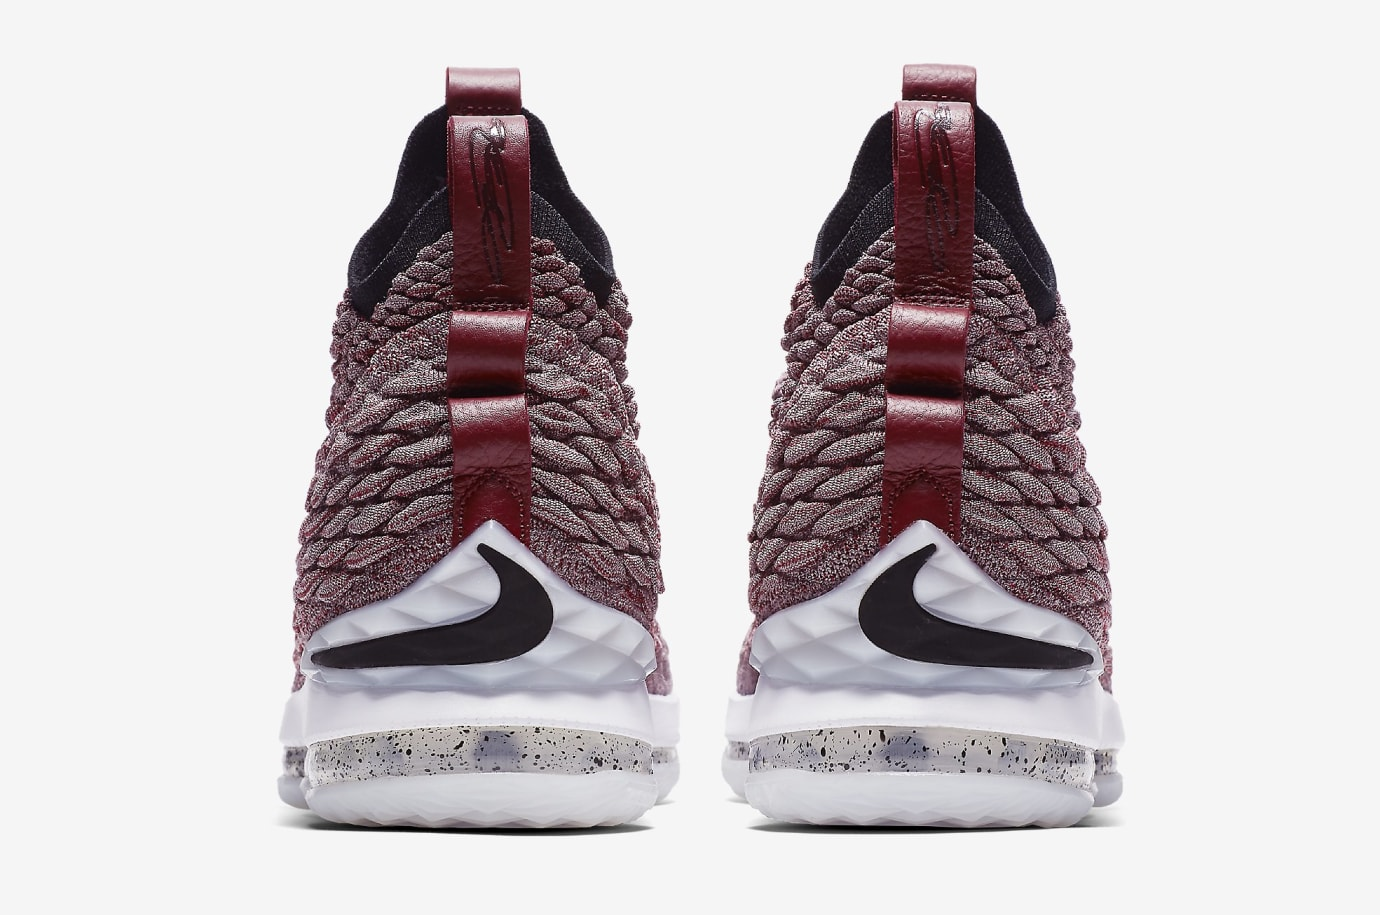 9c4fa48bd2dfed Image via Nike Nike LeBron 15  Wine  897649-201 (Heel)